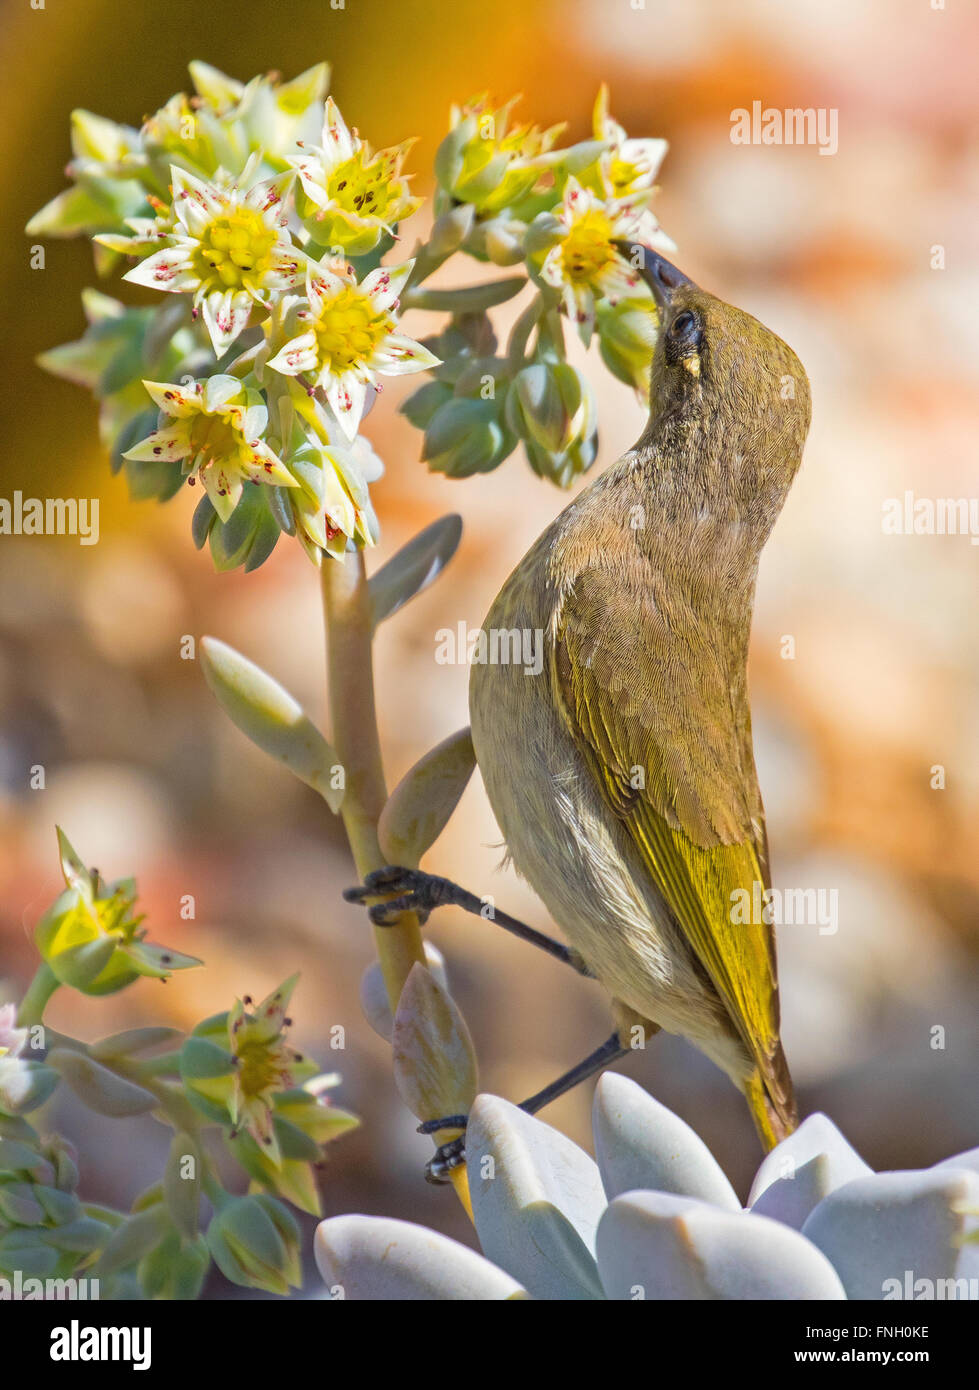 Brown, honeyeater feeding on nectar from succulent, brisbane, queensland, australia - Stock Image